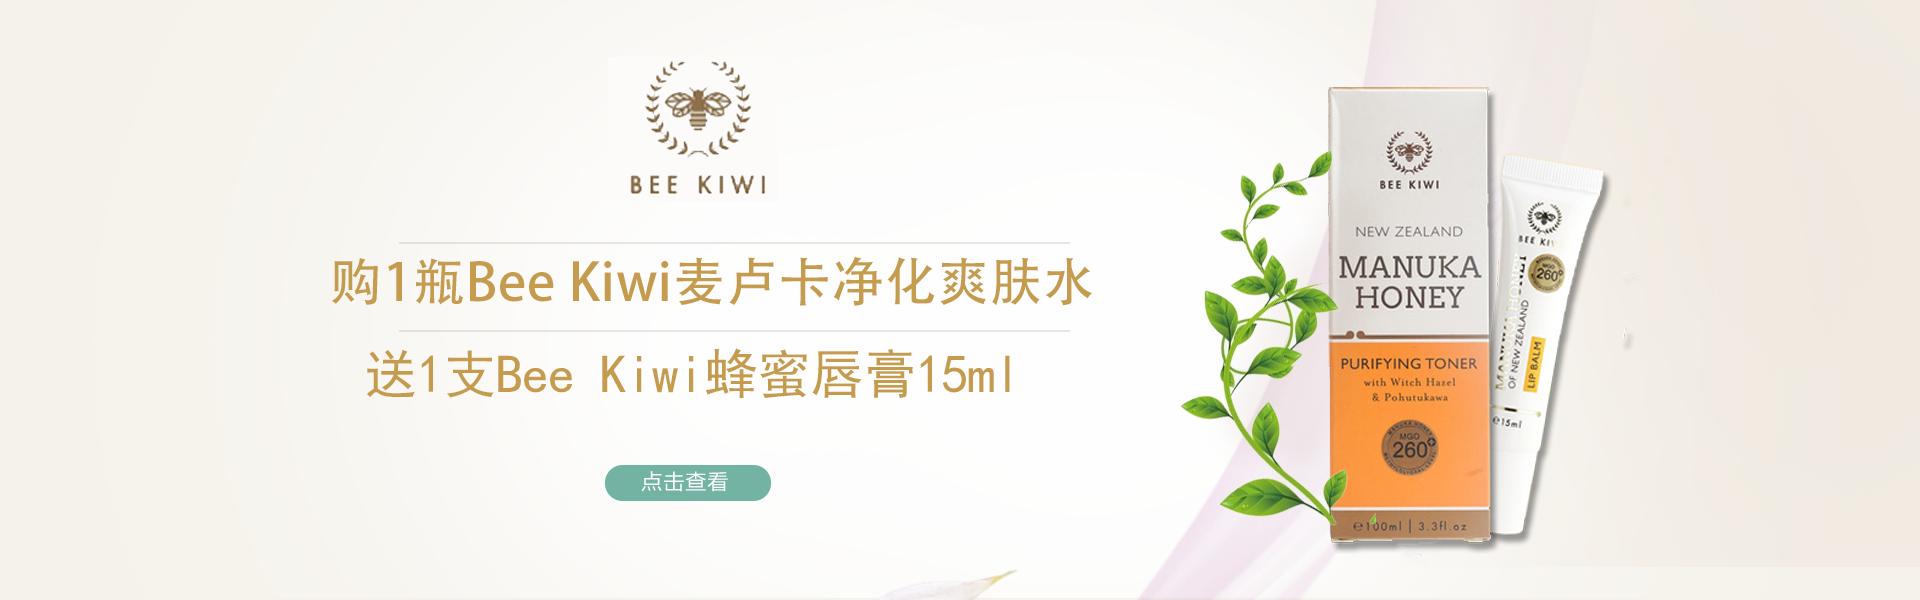 Bee Kiwi购1瓶净化爽肤水送1支蜂蜜唇膏